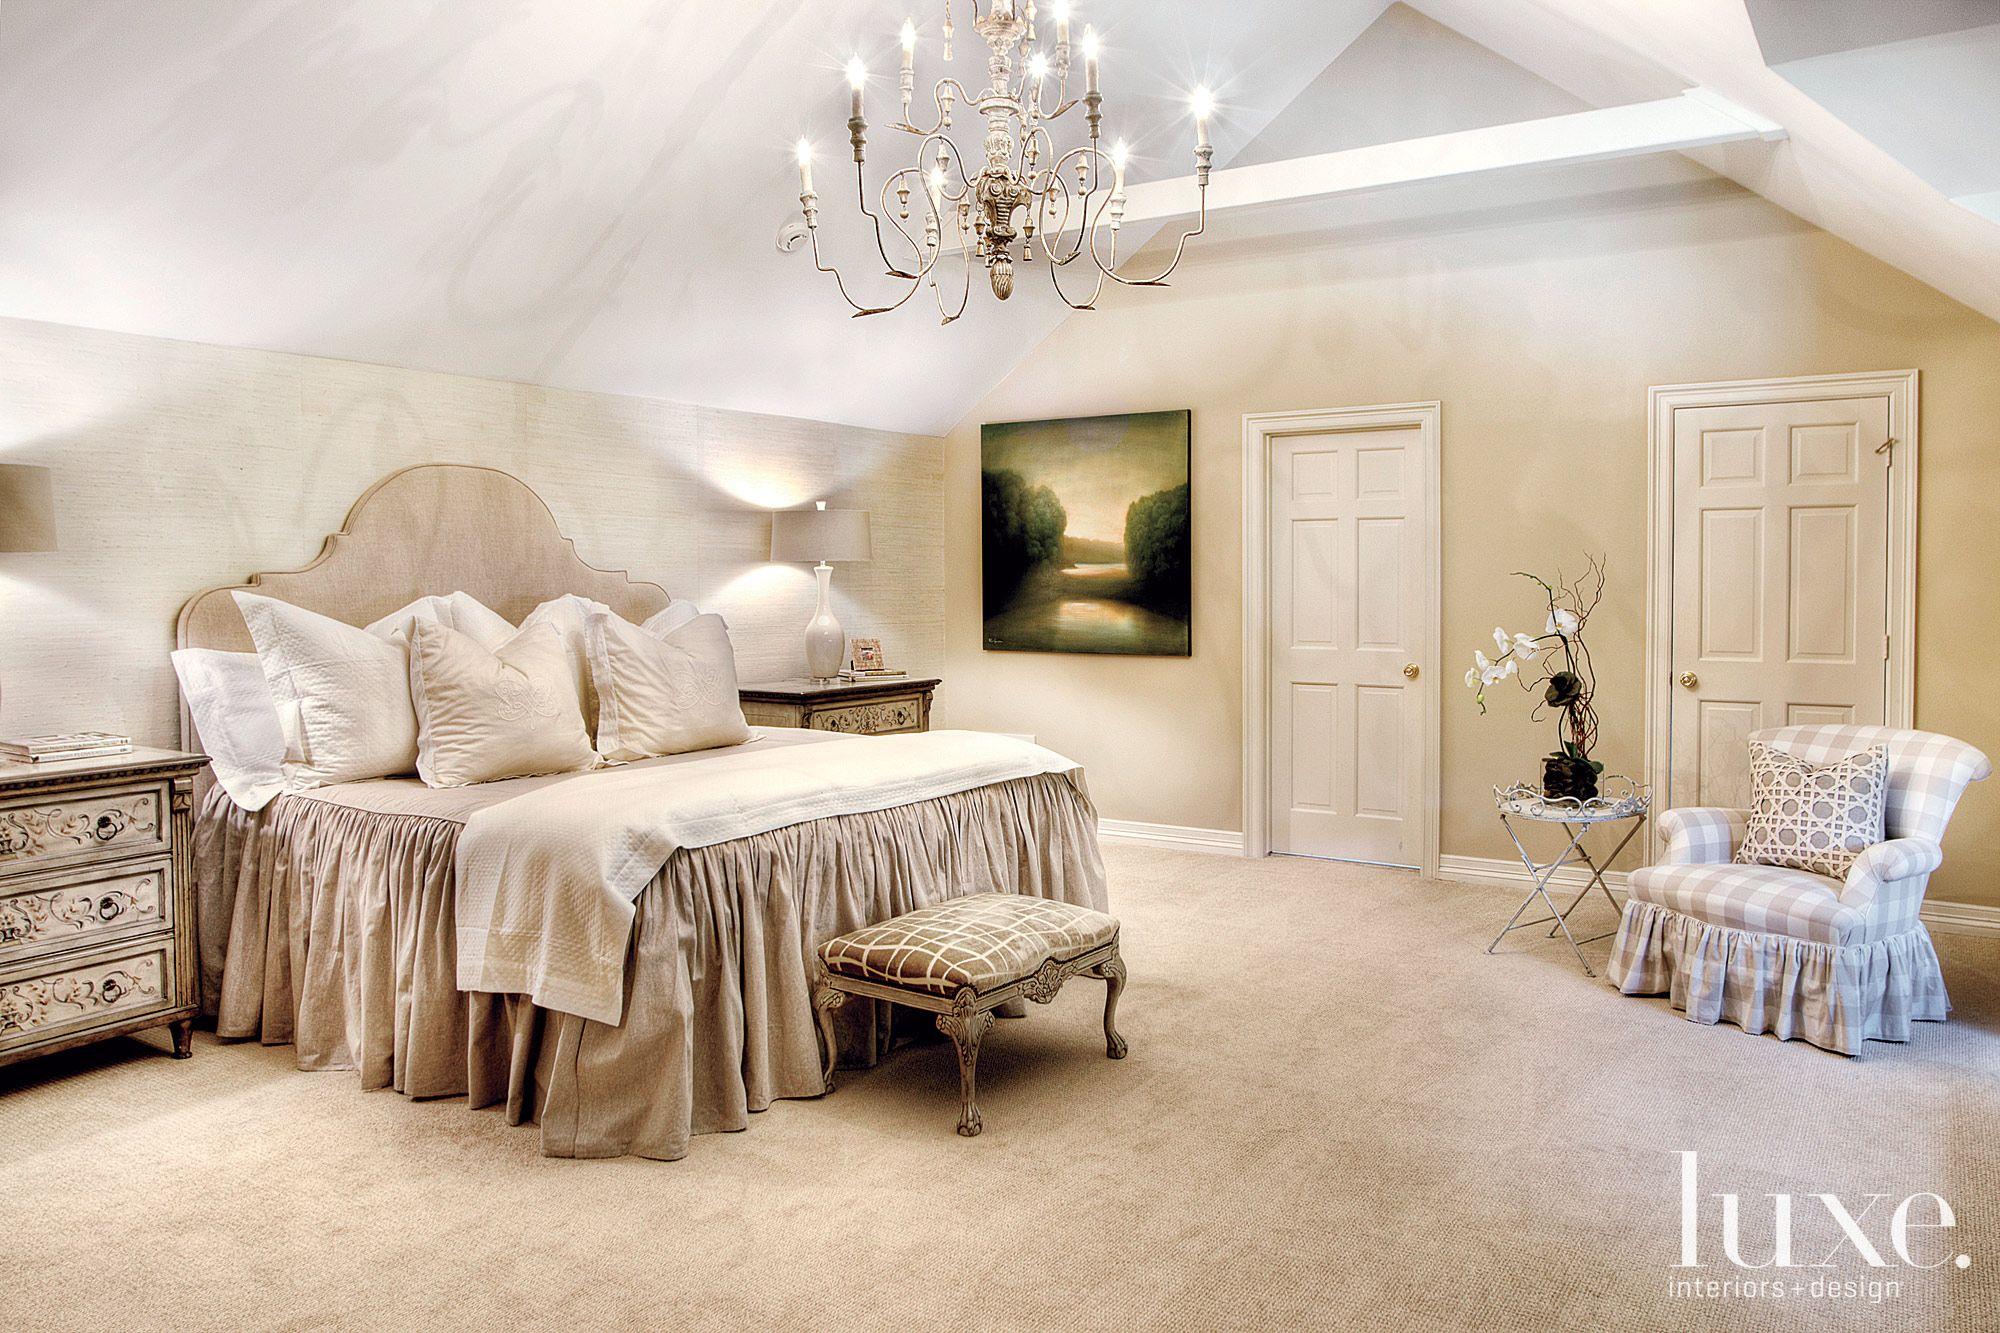 Traditional Cream Bedroom with Elegant Chandelier